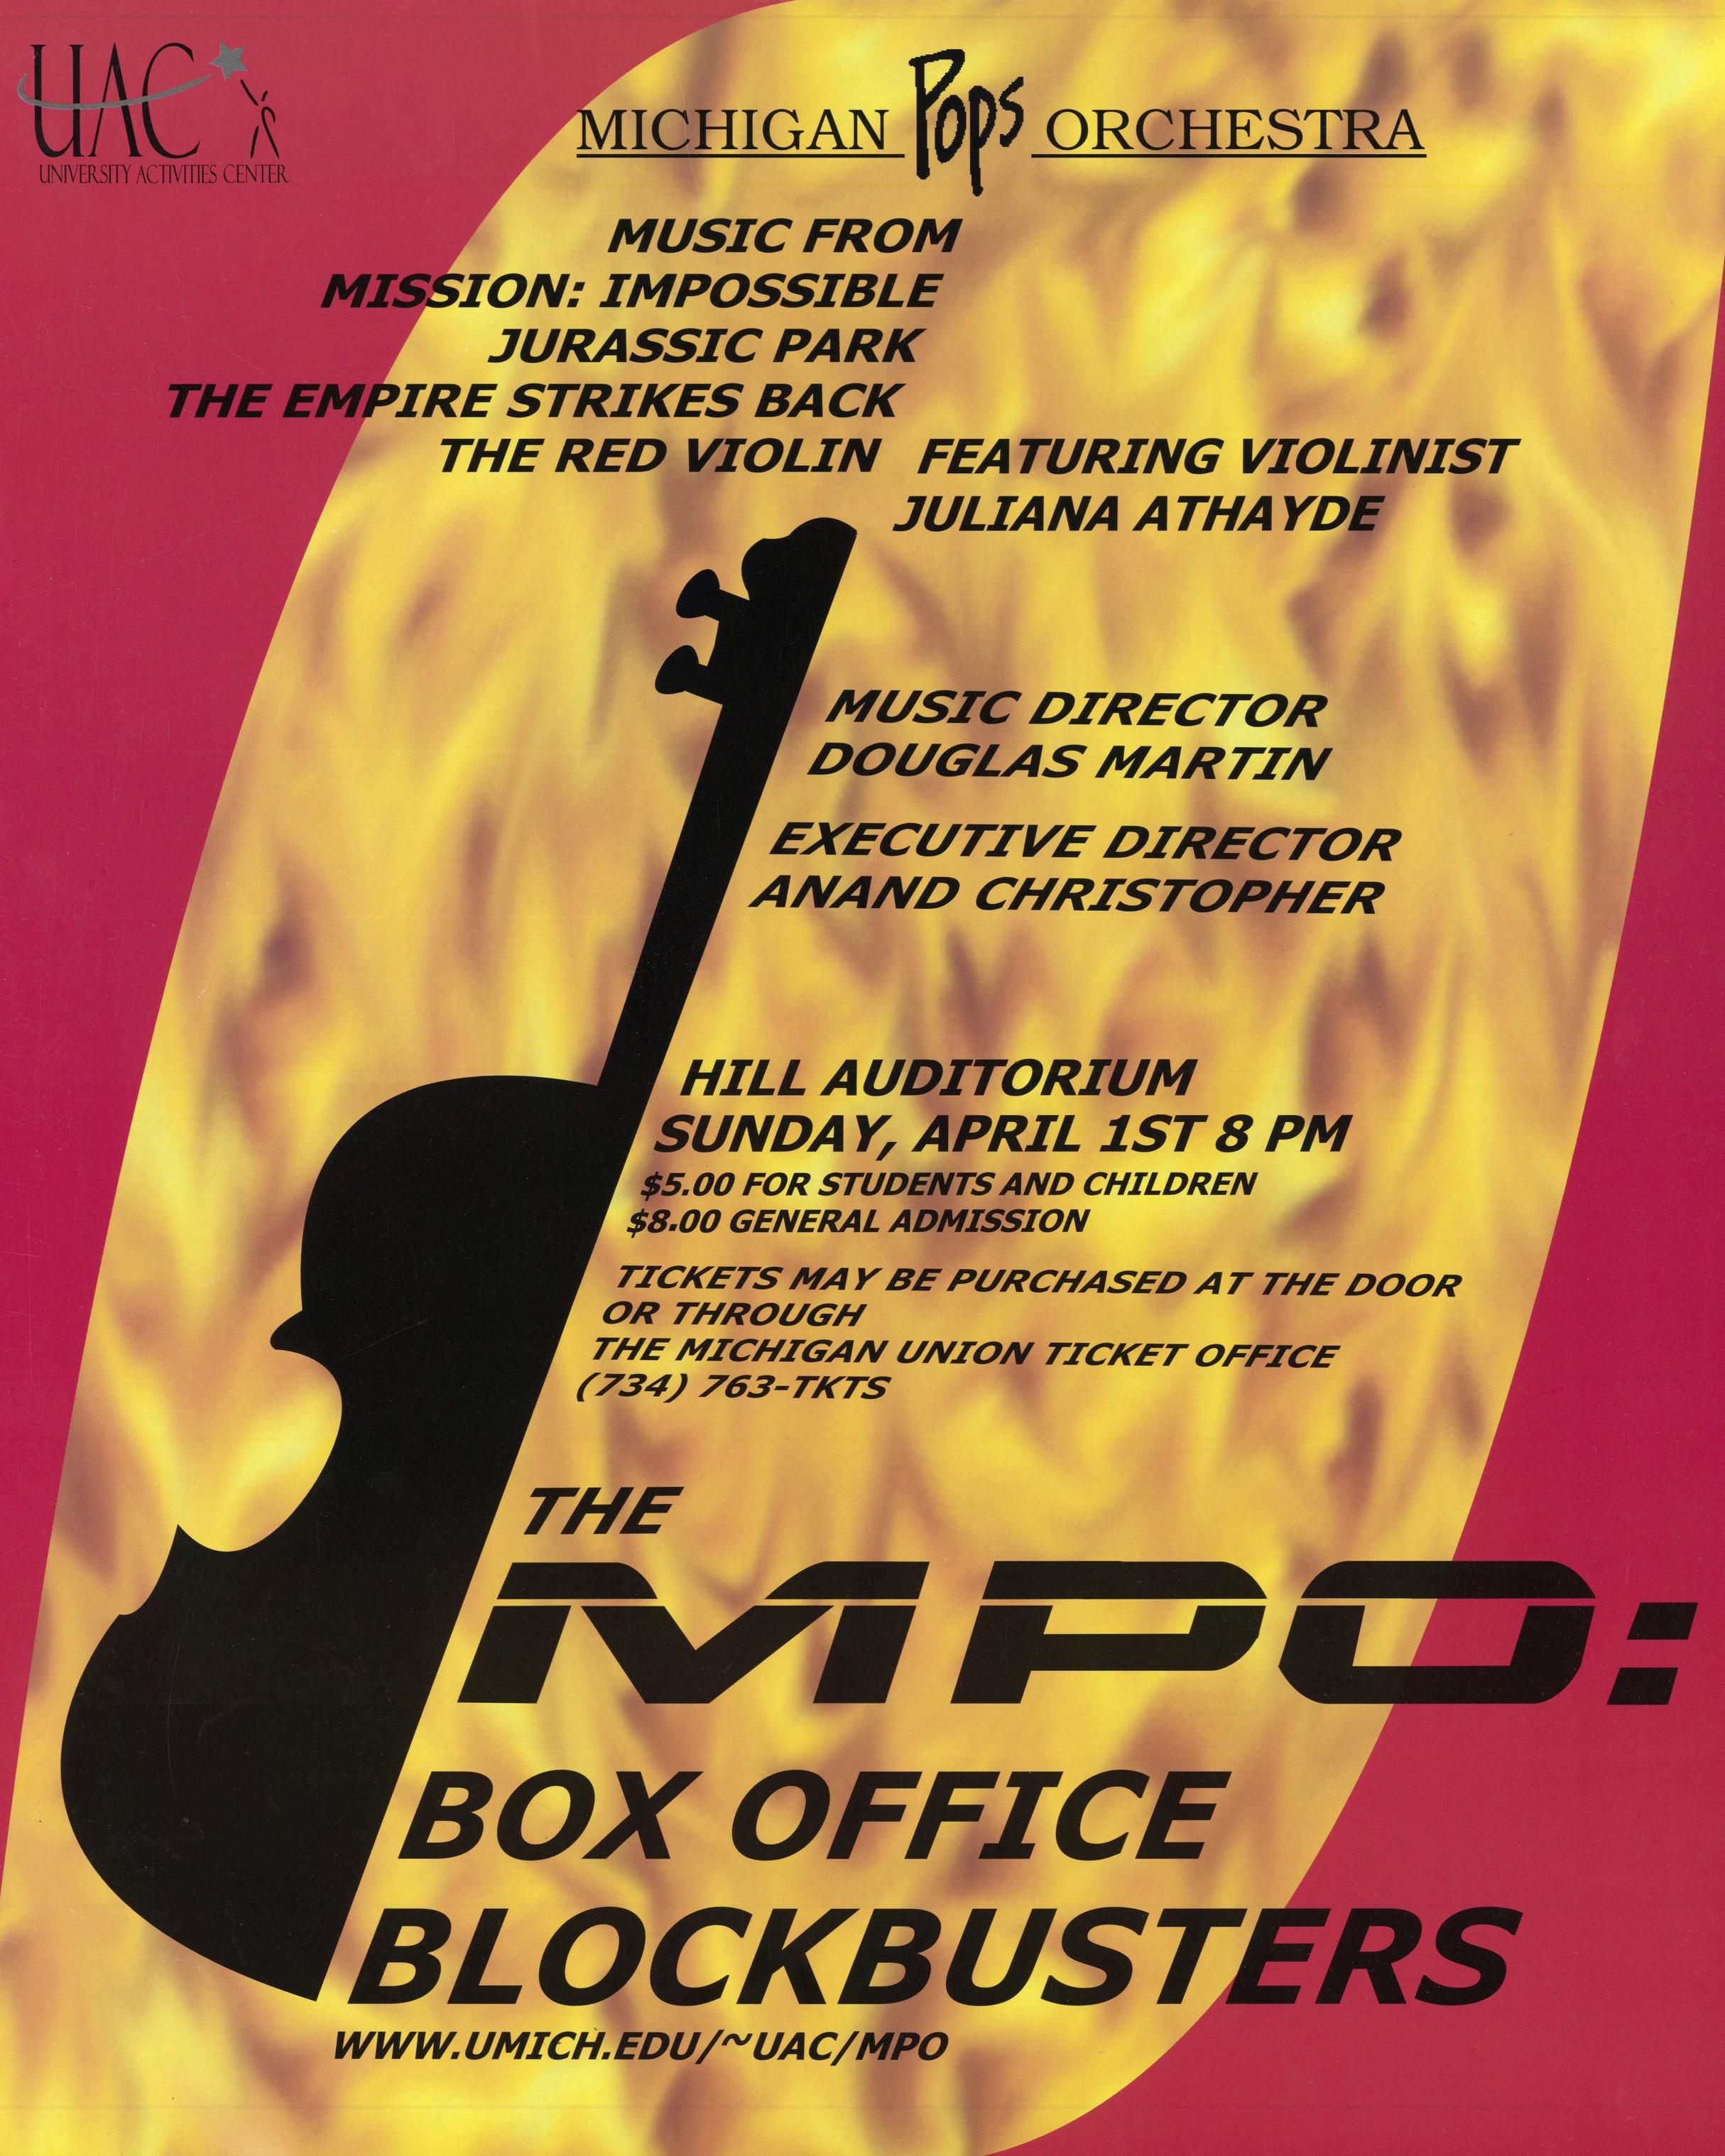 BOX OFFICE BLOCKBUSTERS  April 1, 2001*